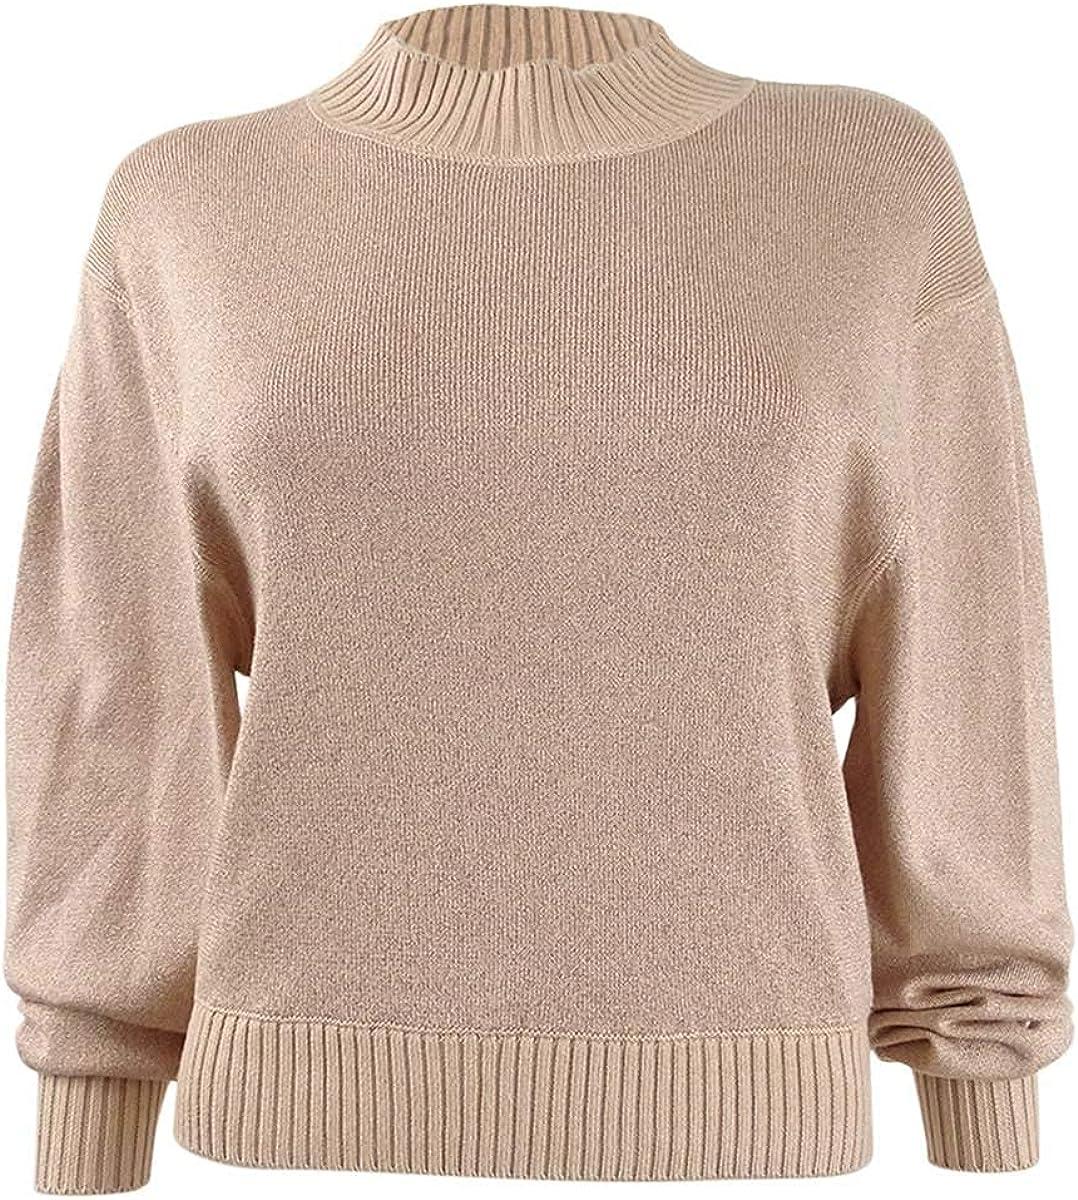 Free People Womens Starry Night Metallic Mock Turtleneck Sweater